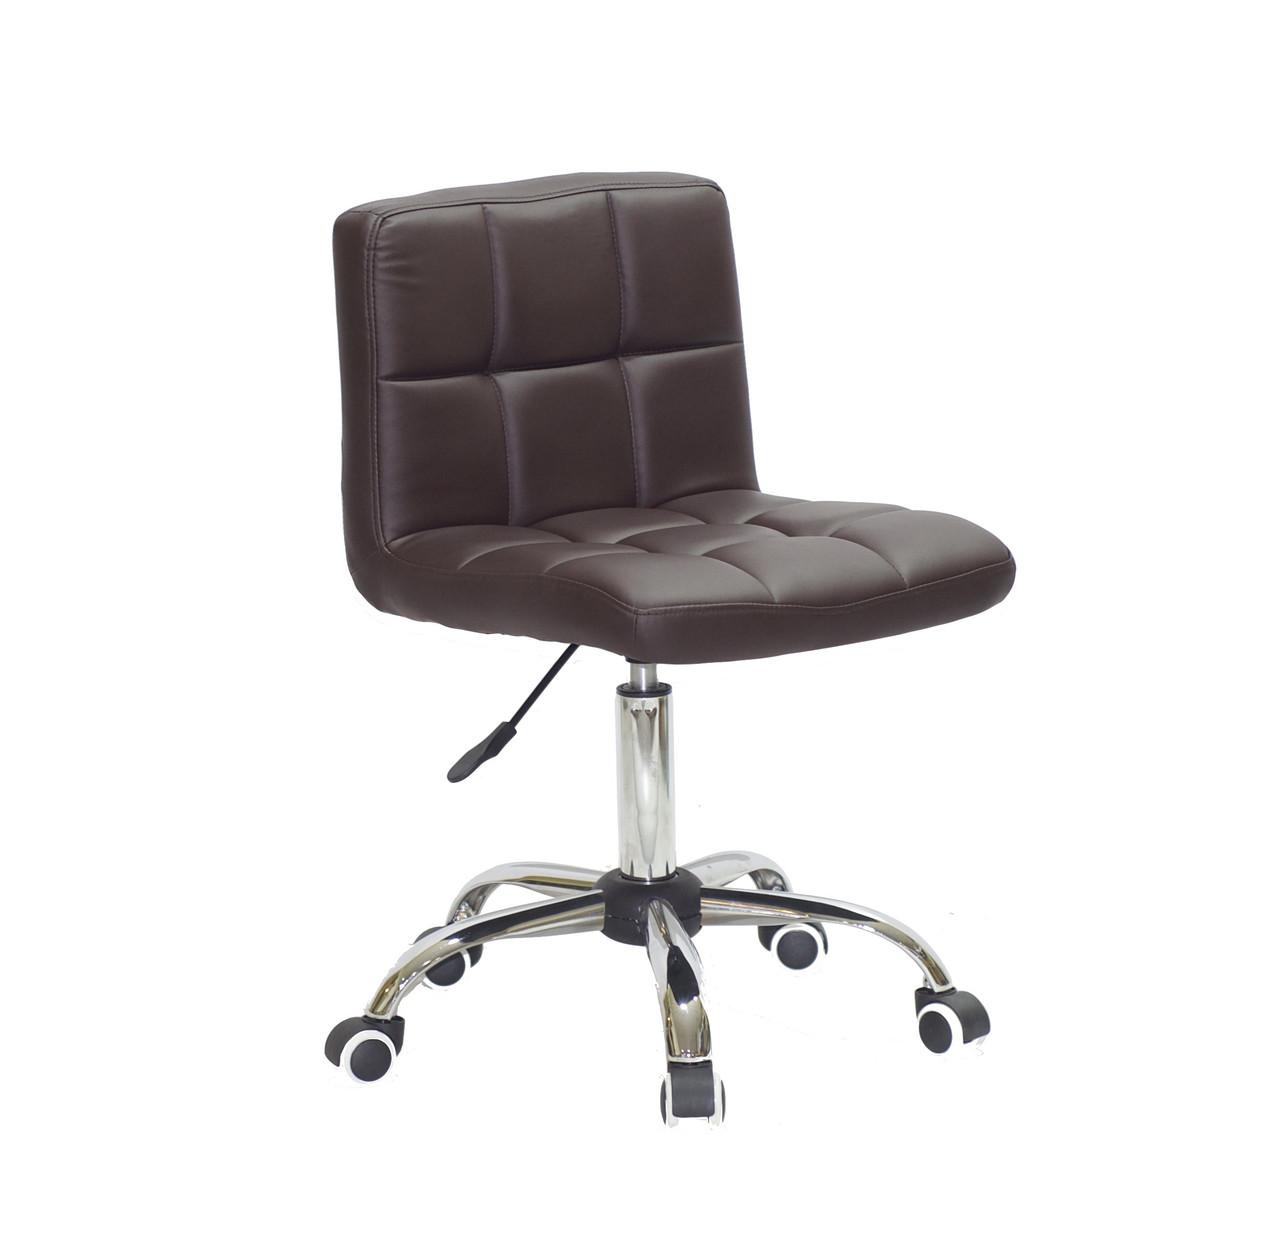 Кресло офисное  на колесах  ARNO СН-OFFICE  еко шкожа , коричневый 1015